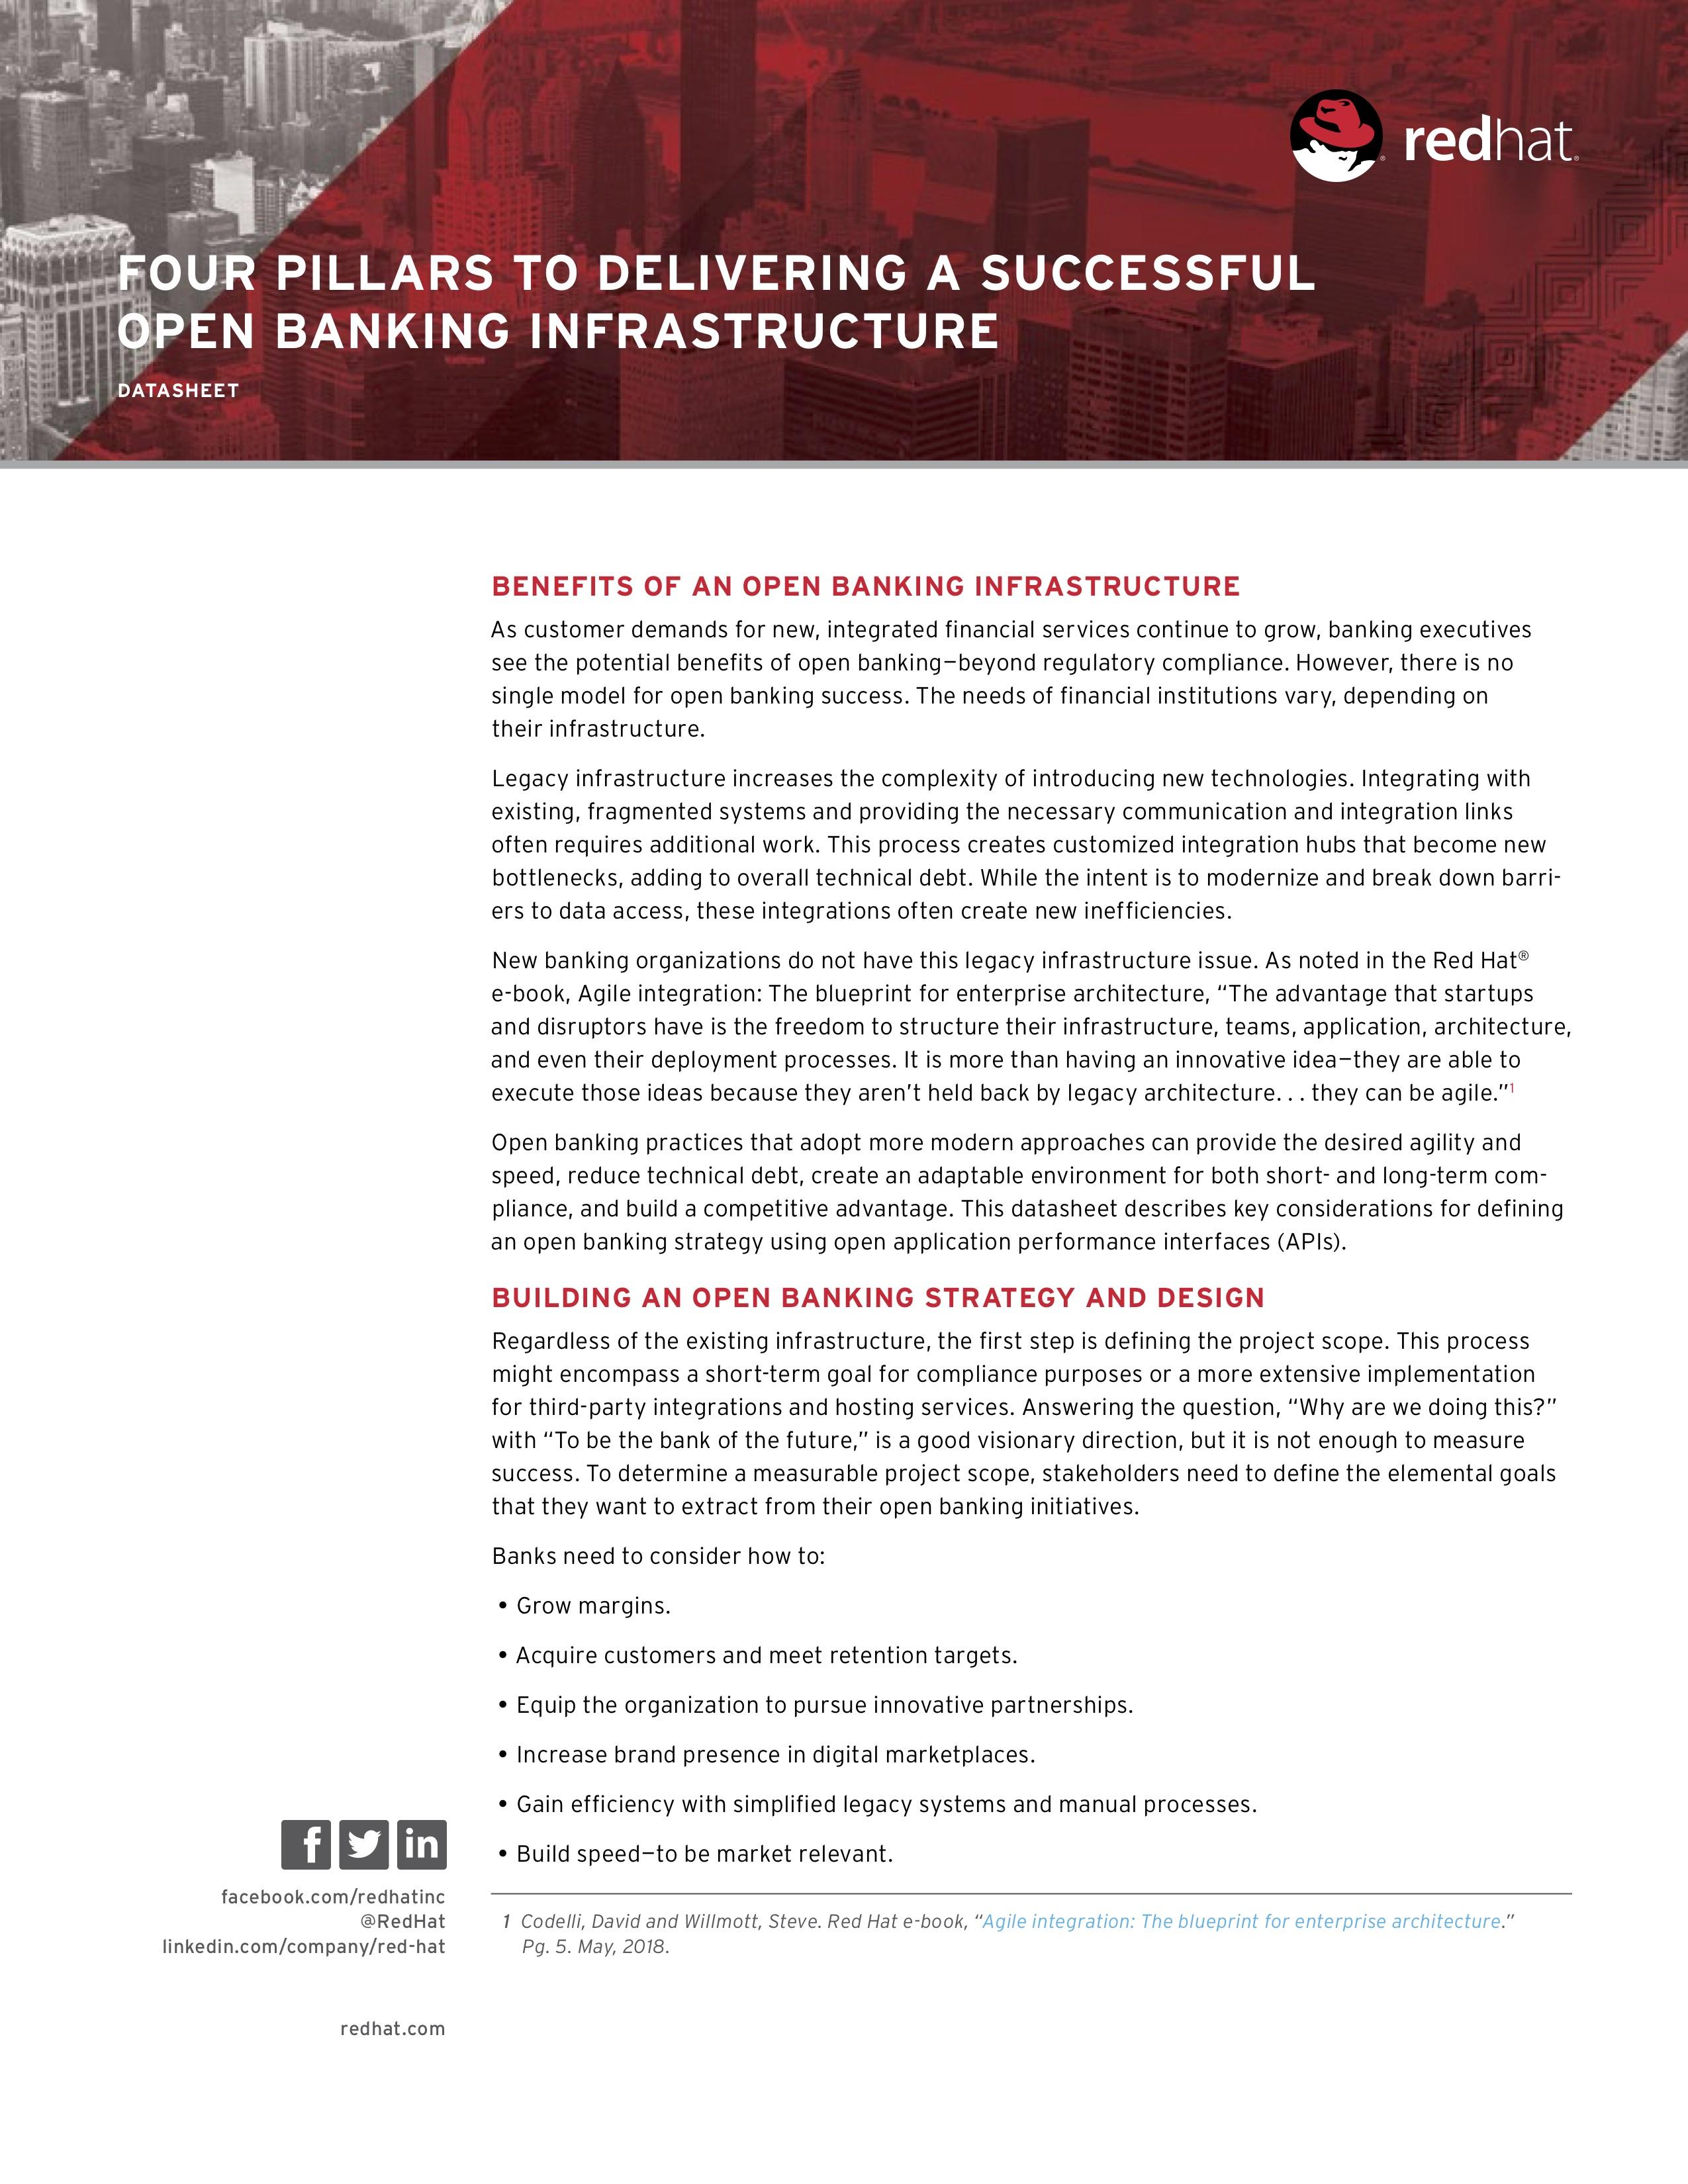 Ve fsi four pillars open banking tech overview f14090wg 201809 en